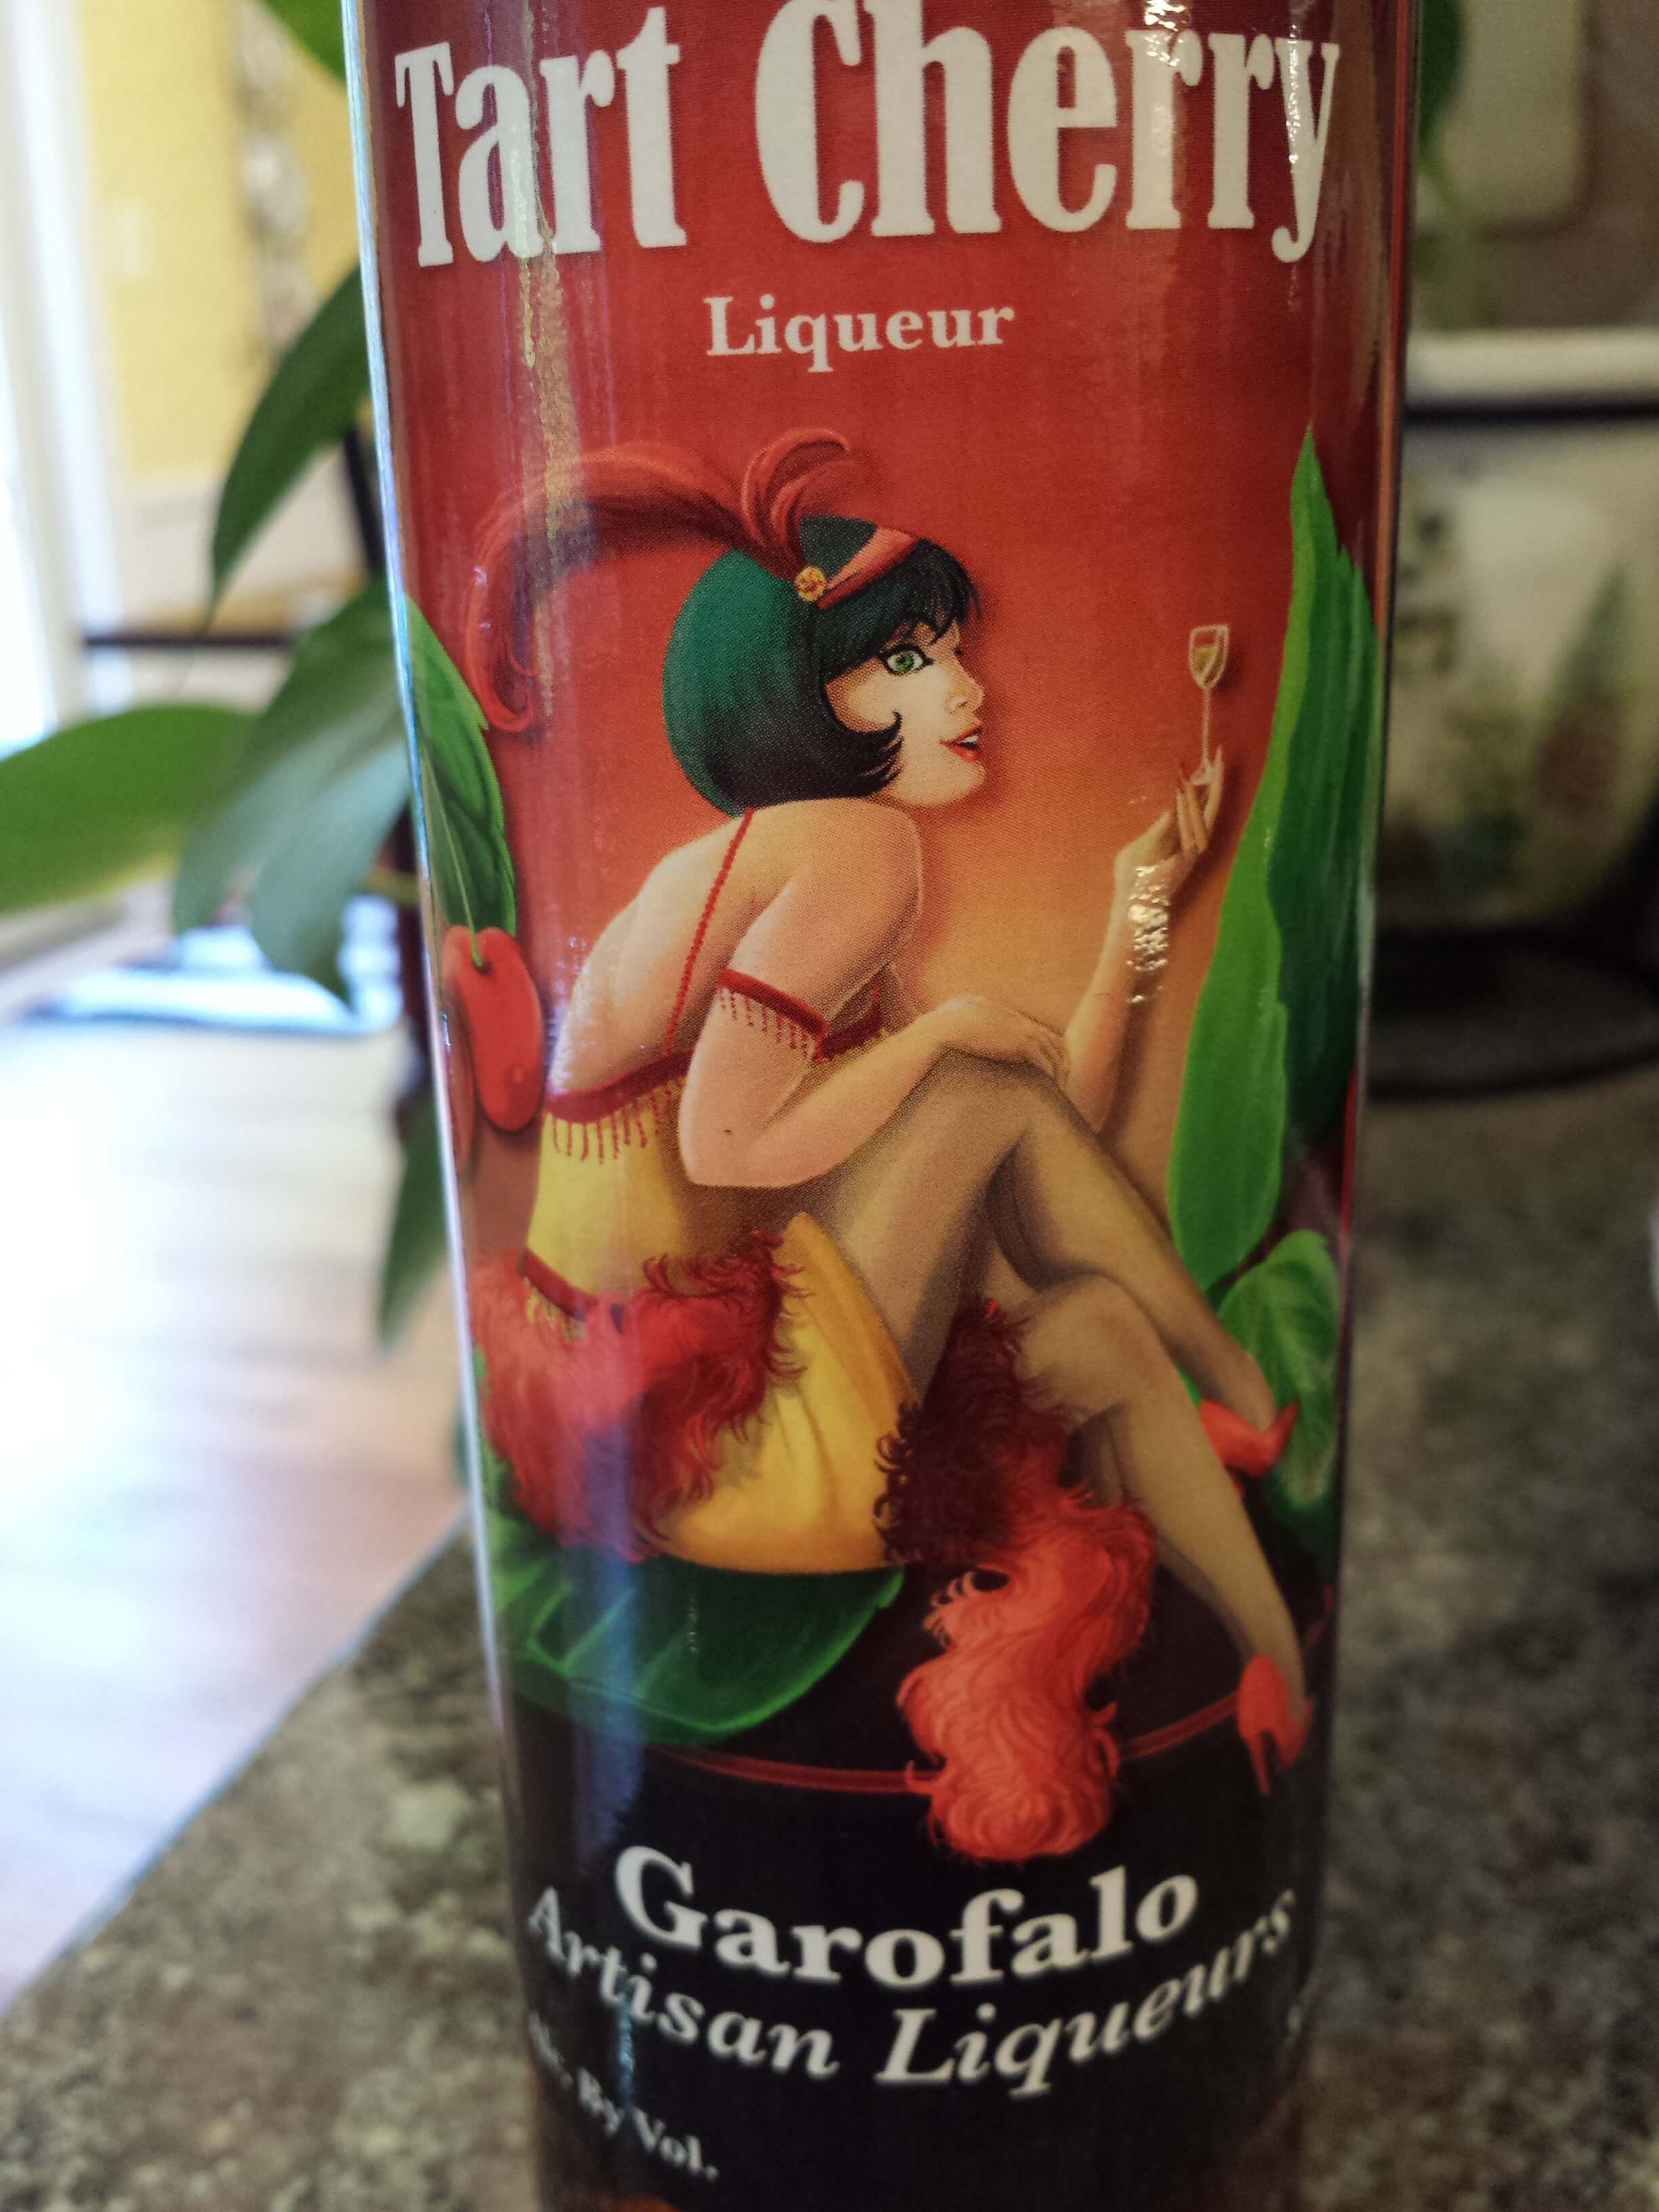 Garofalo Artisan Liqueurs Tart Cherry Liqueur Cherry Liqueur Liqueur Cherry Tart